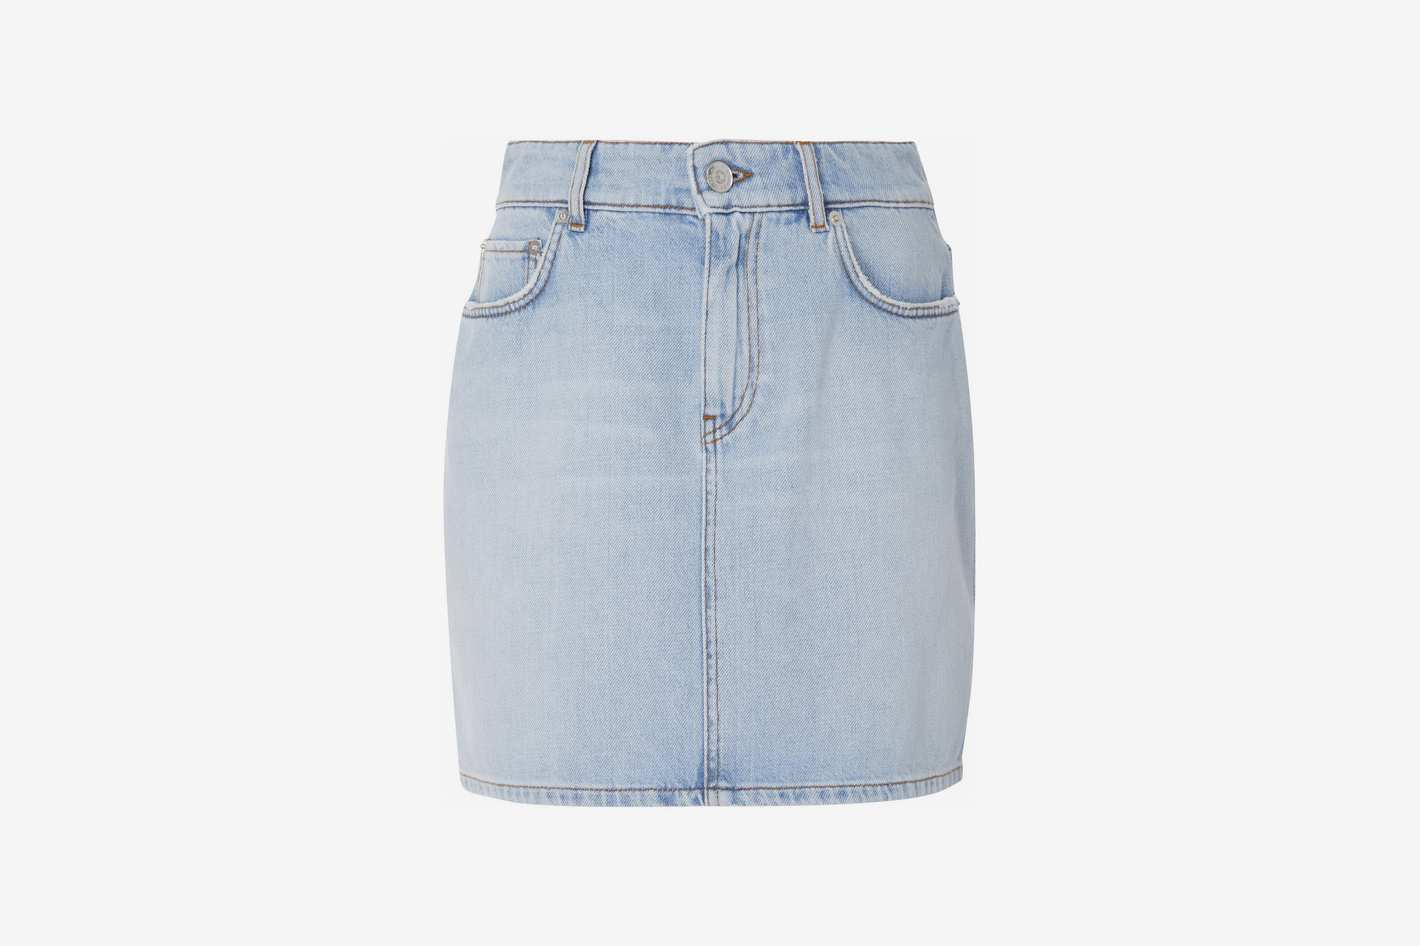 972975c811f Sale: Nordstrom, Macy's, Adidas, Lululemon, More 2019